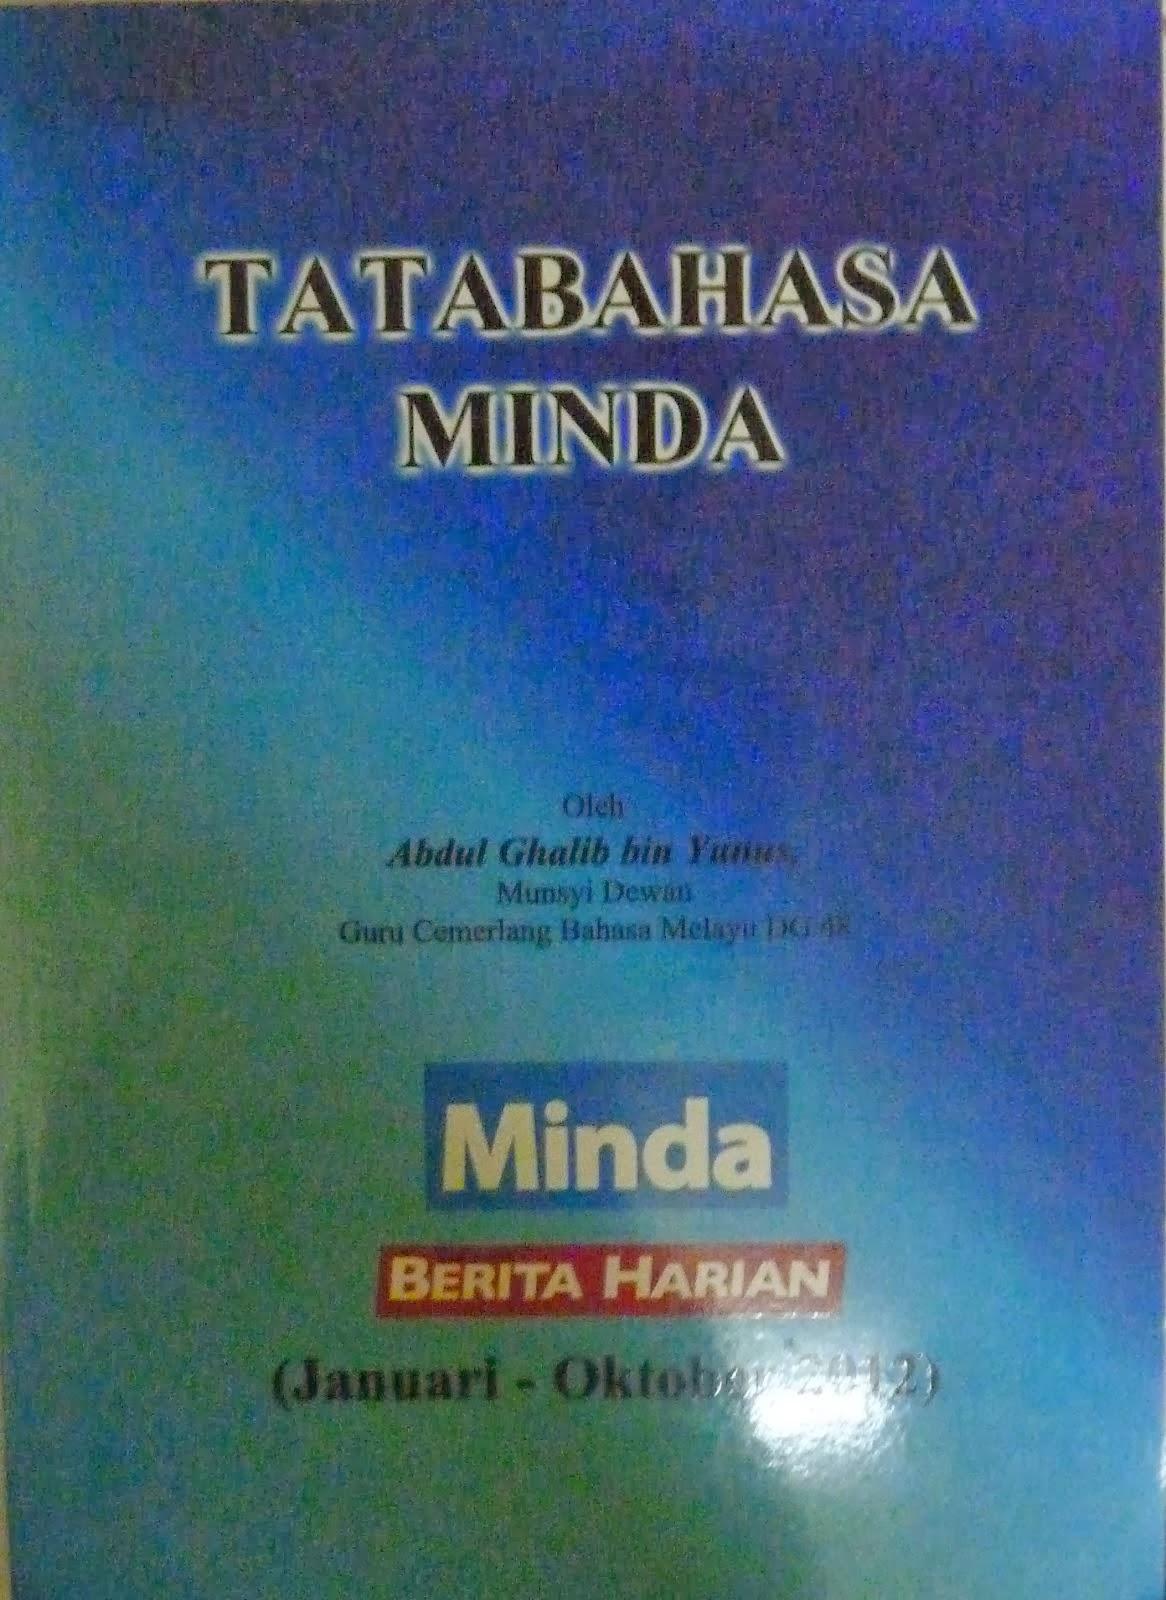 Tatabahasa Minda 2012